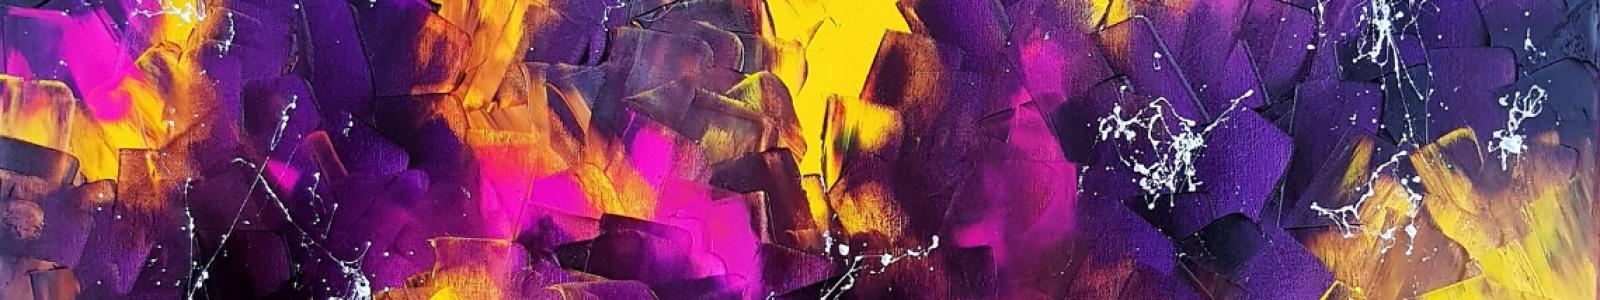 Gallery Painter Daria Zaseda